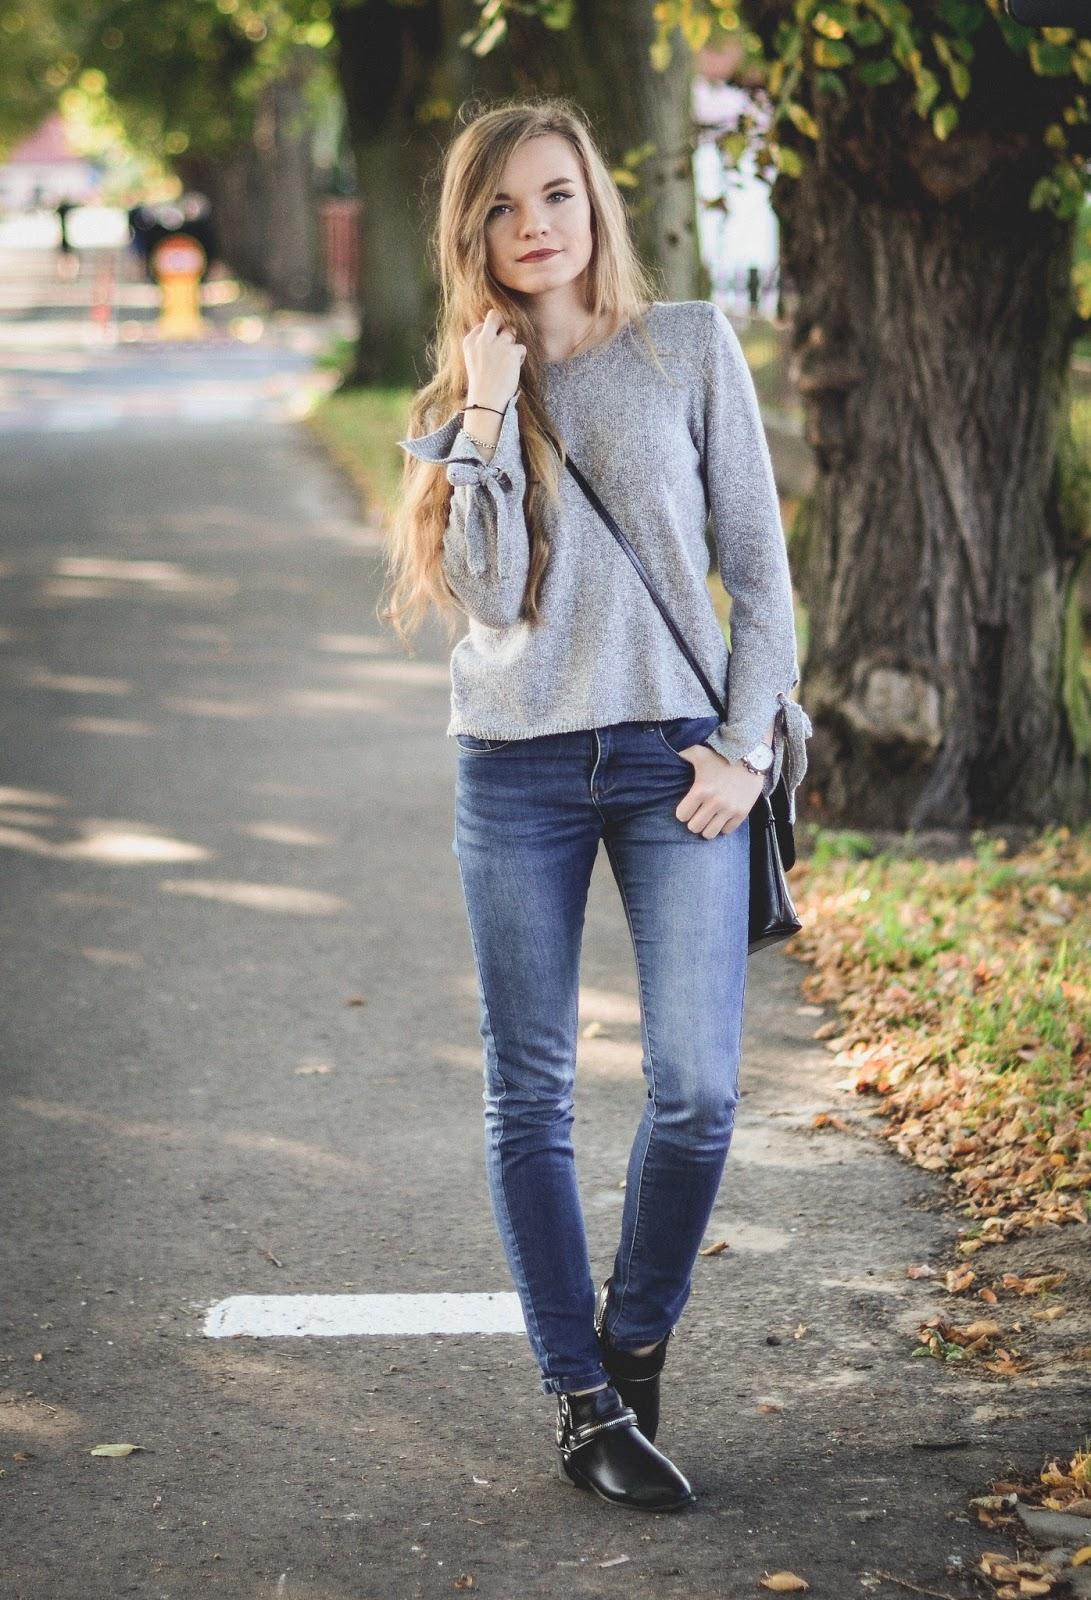 UNCARO: Street Style: Gray sweater